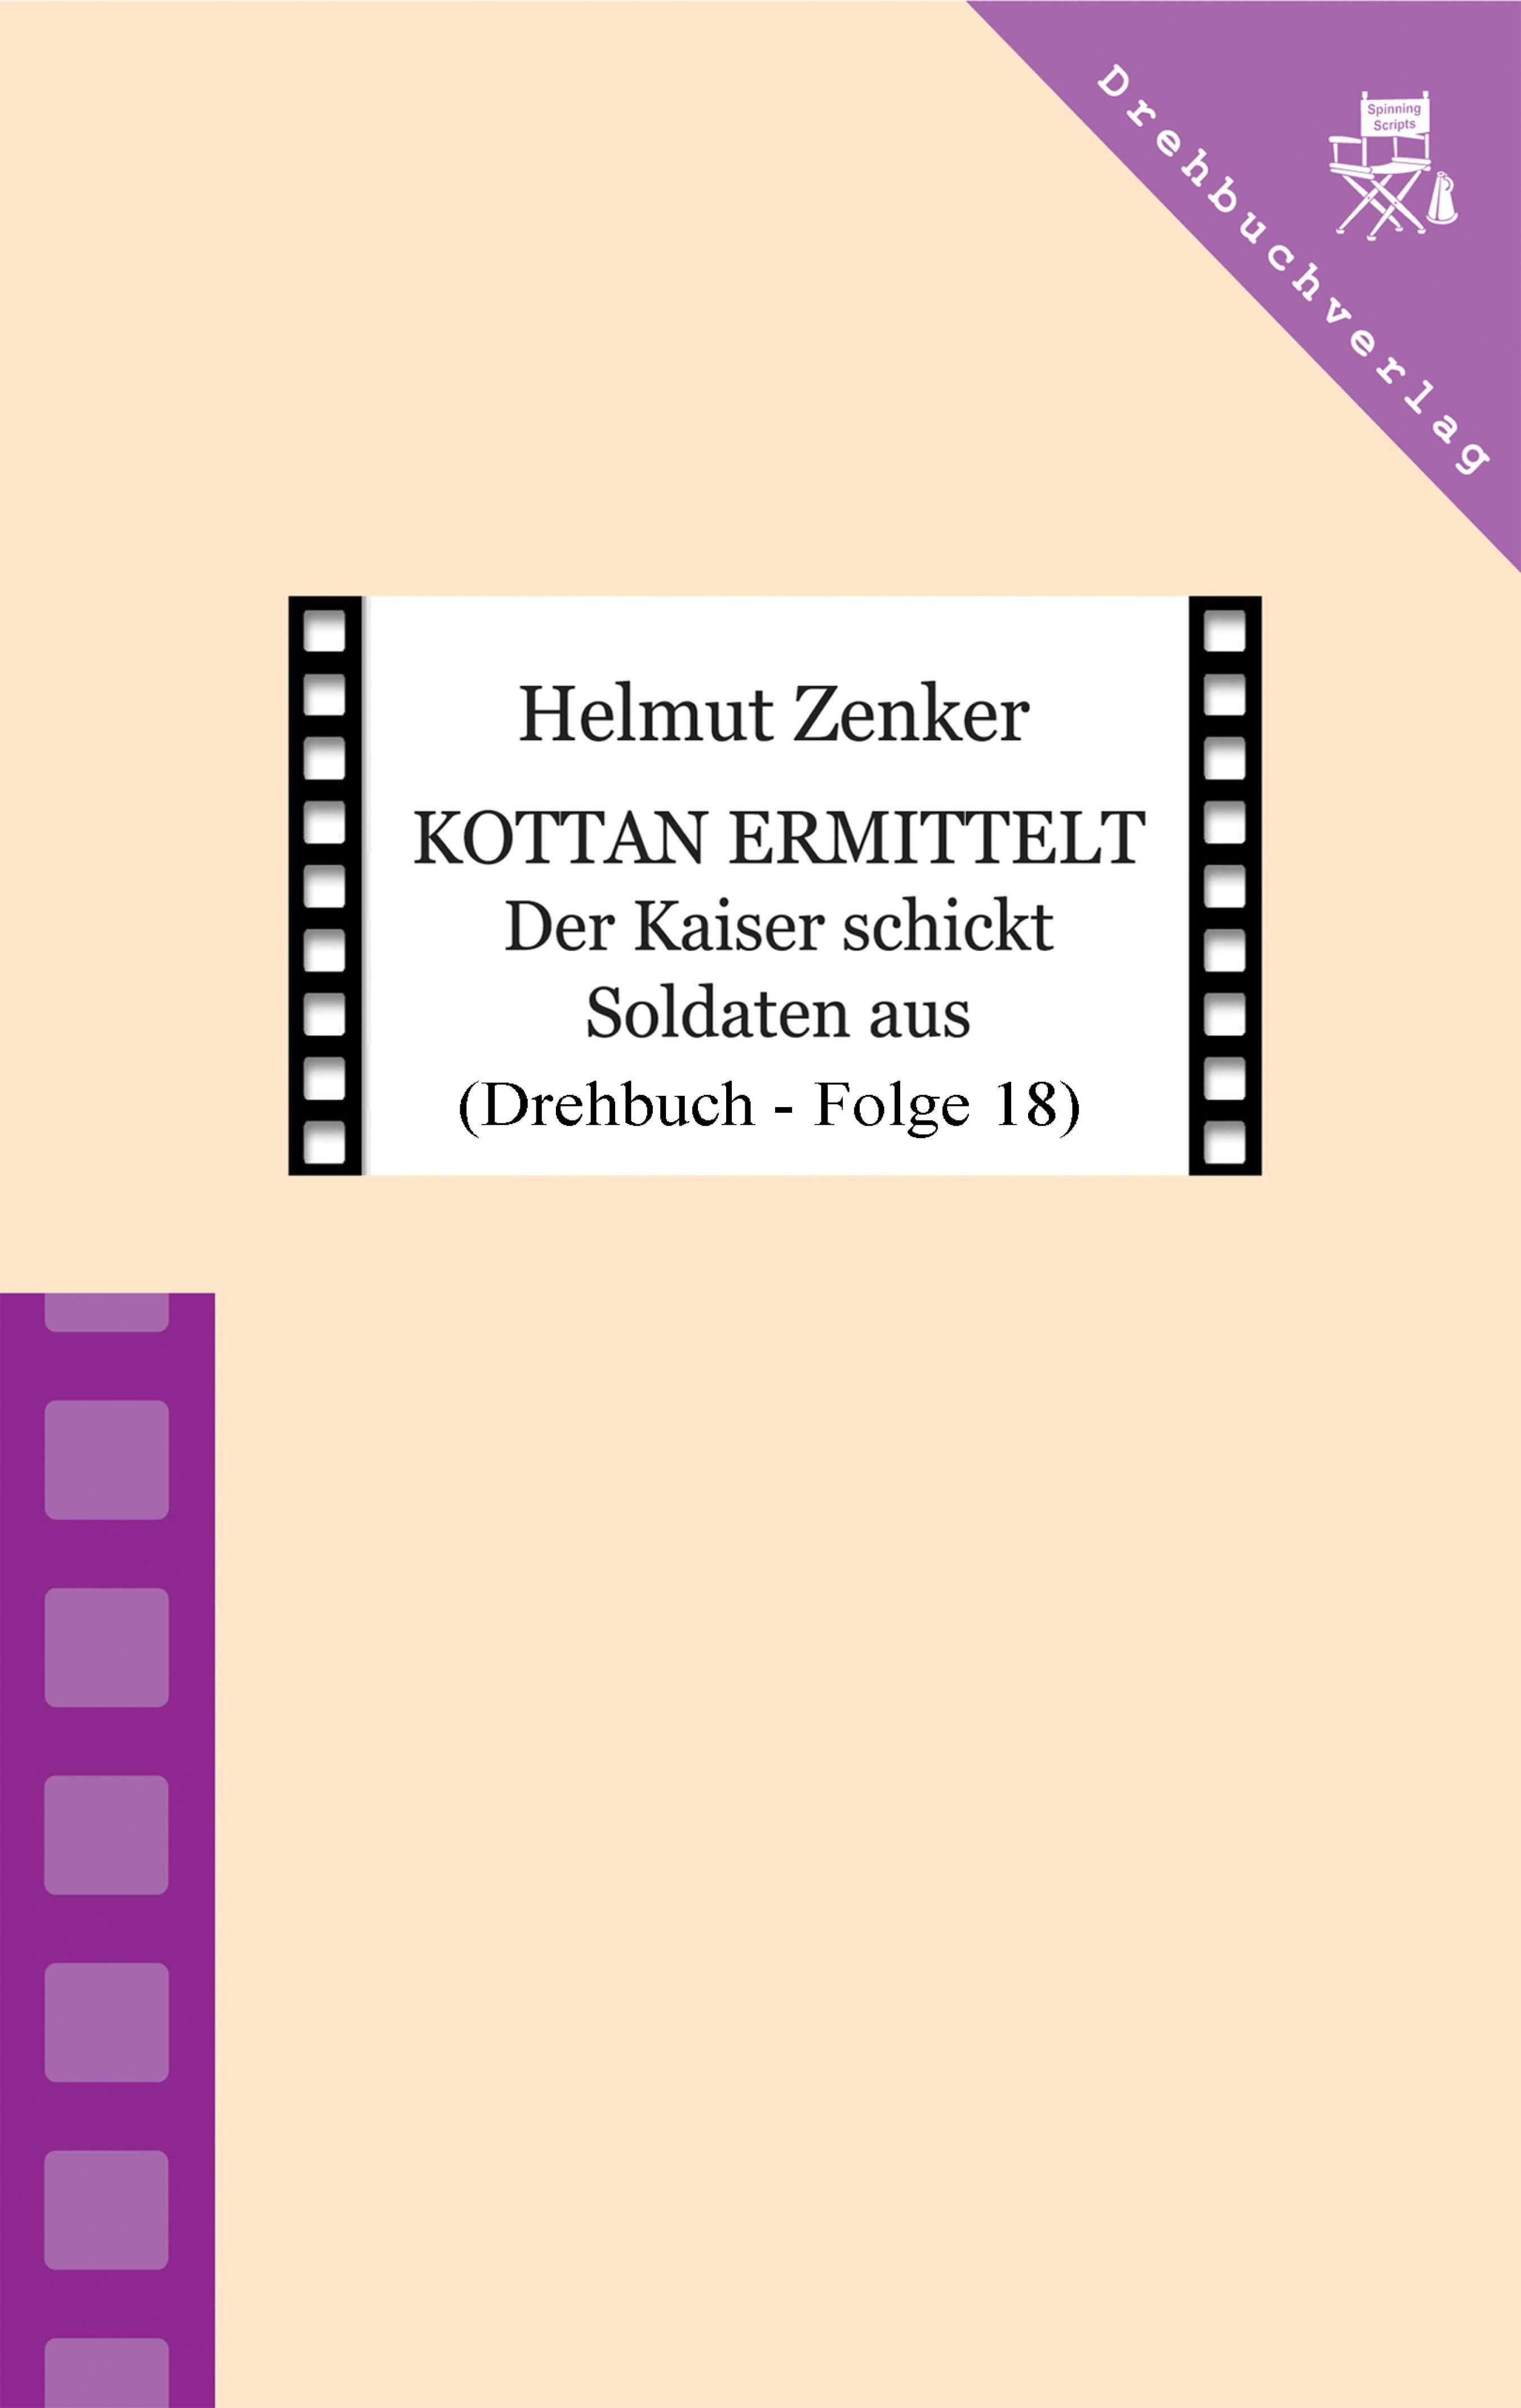 Helmut Zenker Kottan ermittelt: Der Kaiser schickt Soldaten aus